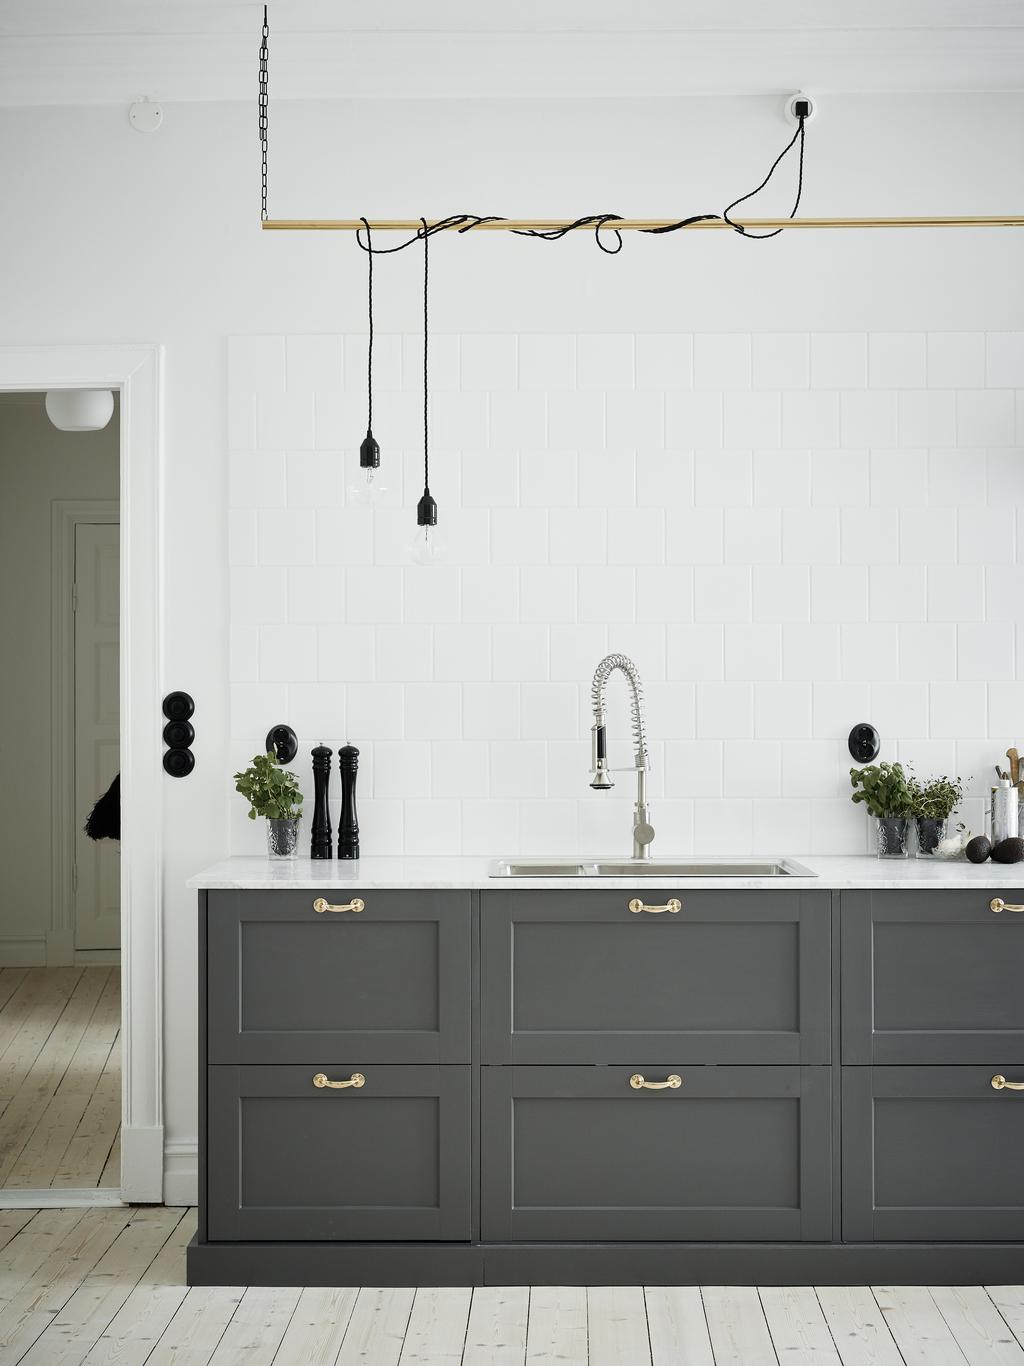 ultimas tendencias cocinas estilo nrdico integrados decoracin cocinas cocinas nrdicas cocinas grises modernas cocinas blancas